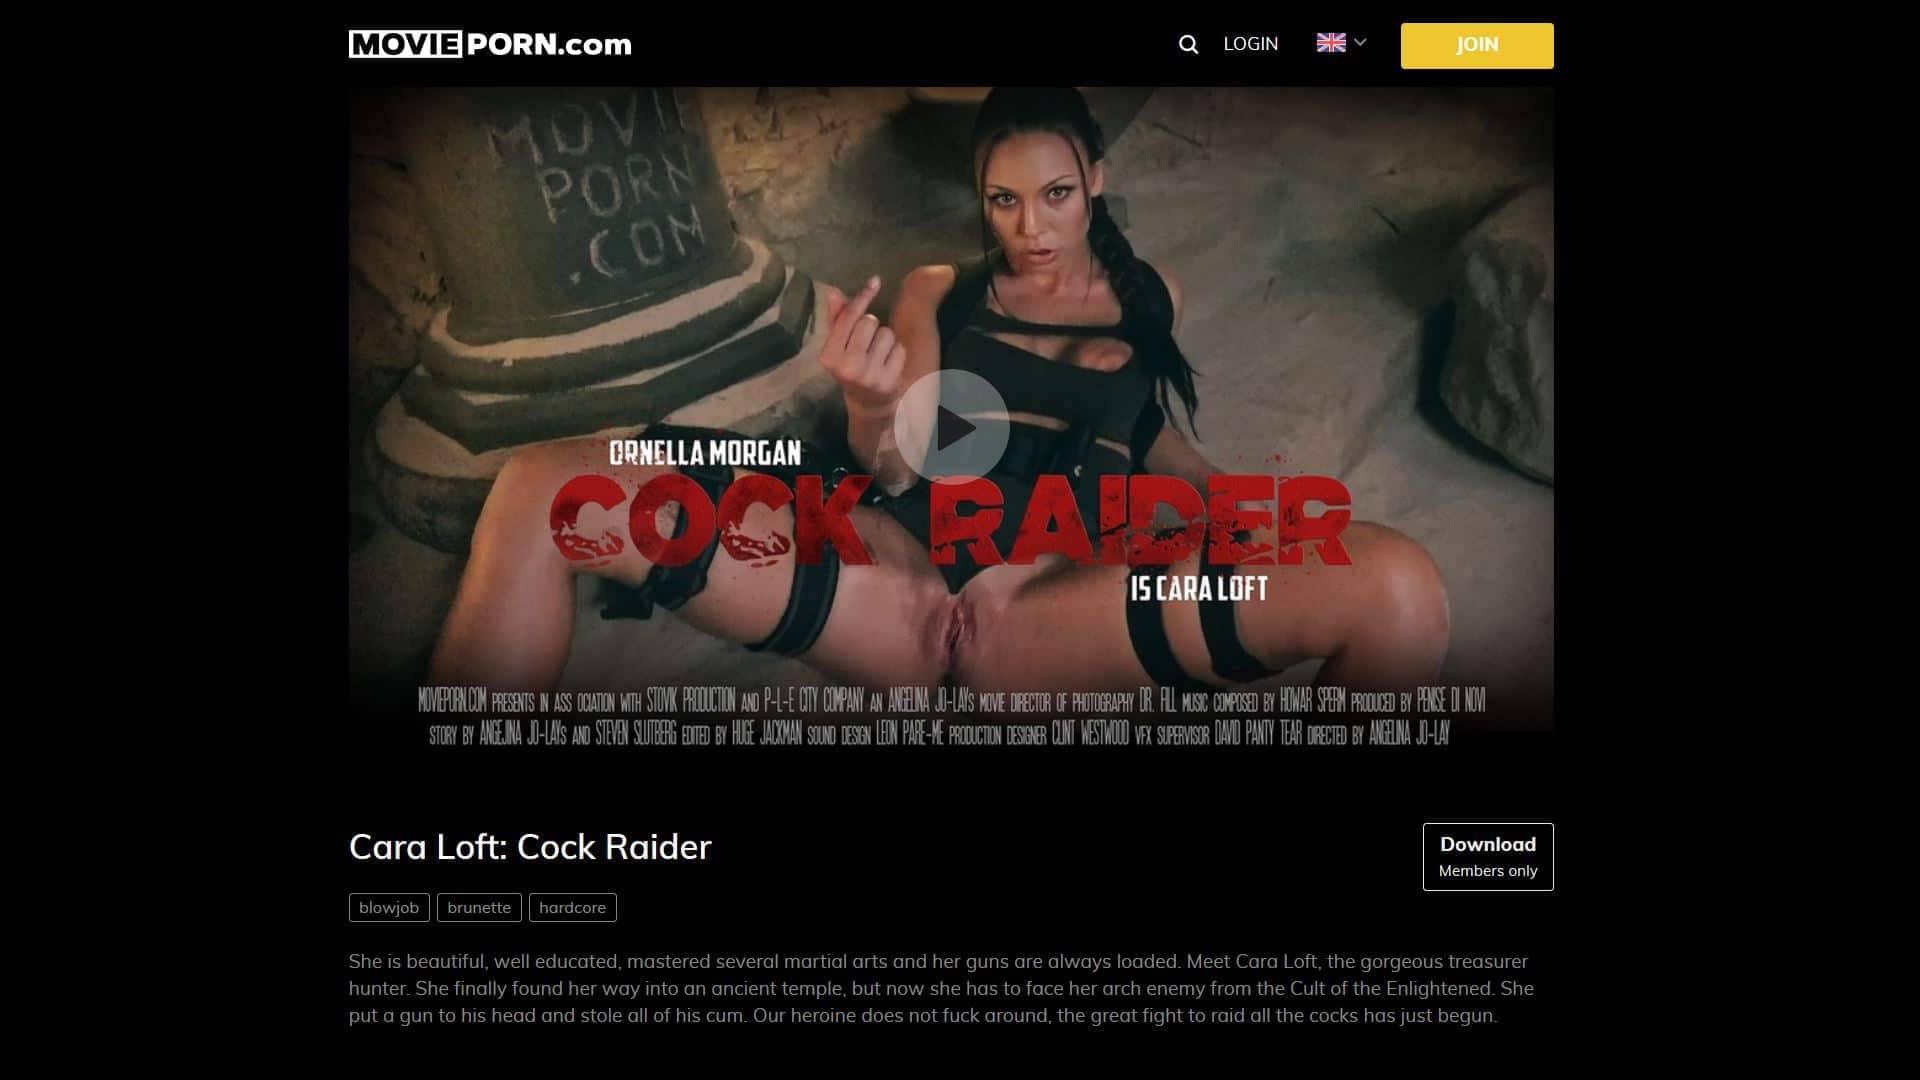 MoviePorn Cock Raider